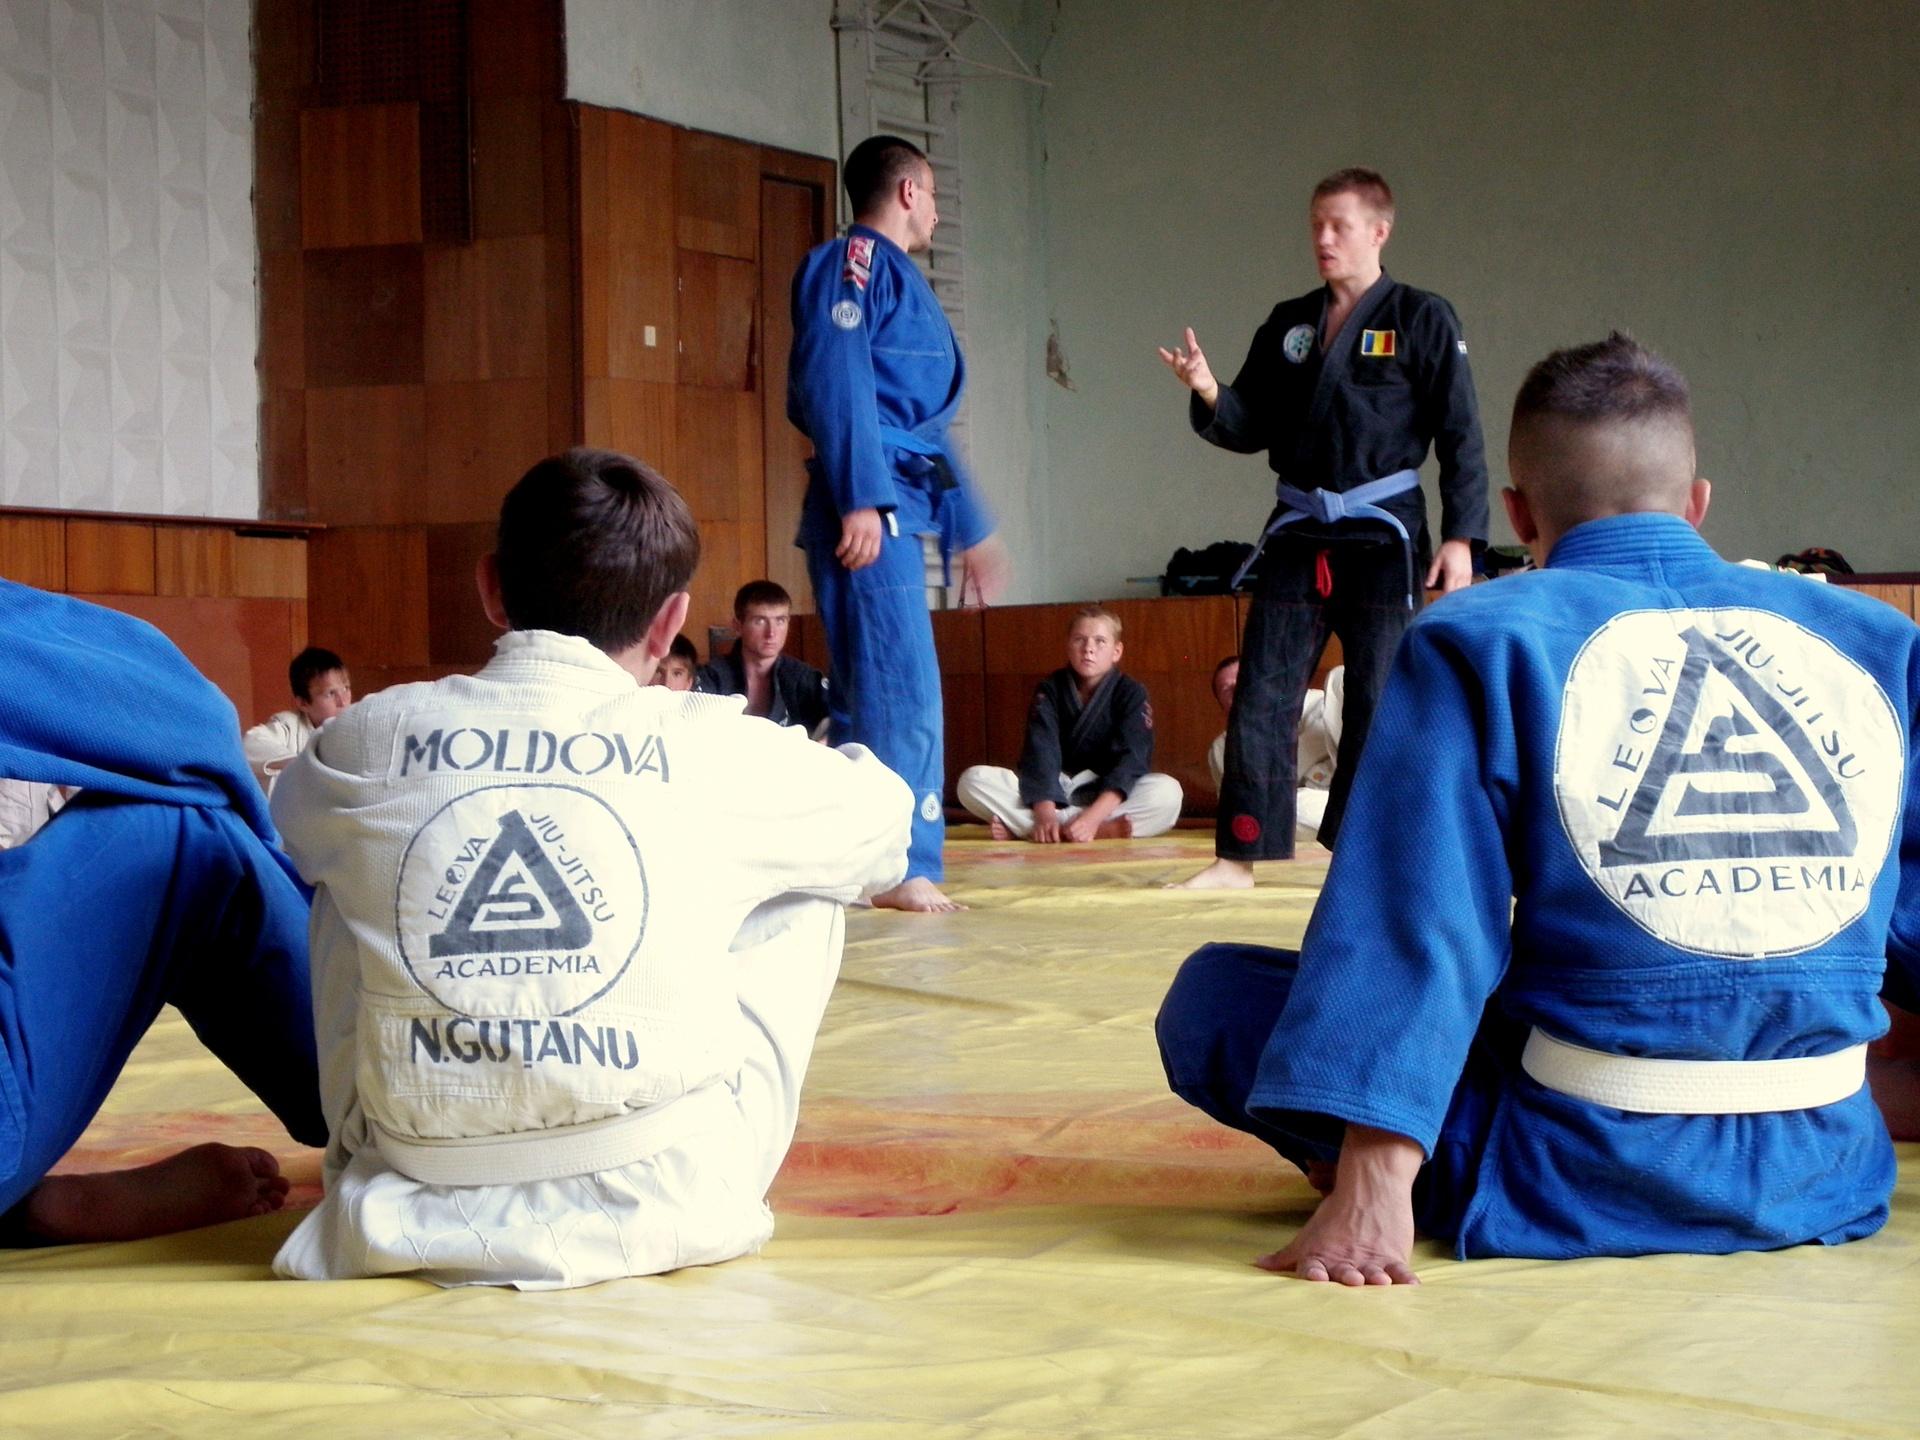 Burlacu TriDuals 2012 - Seminar